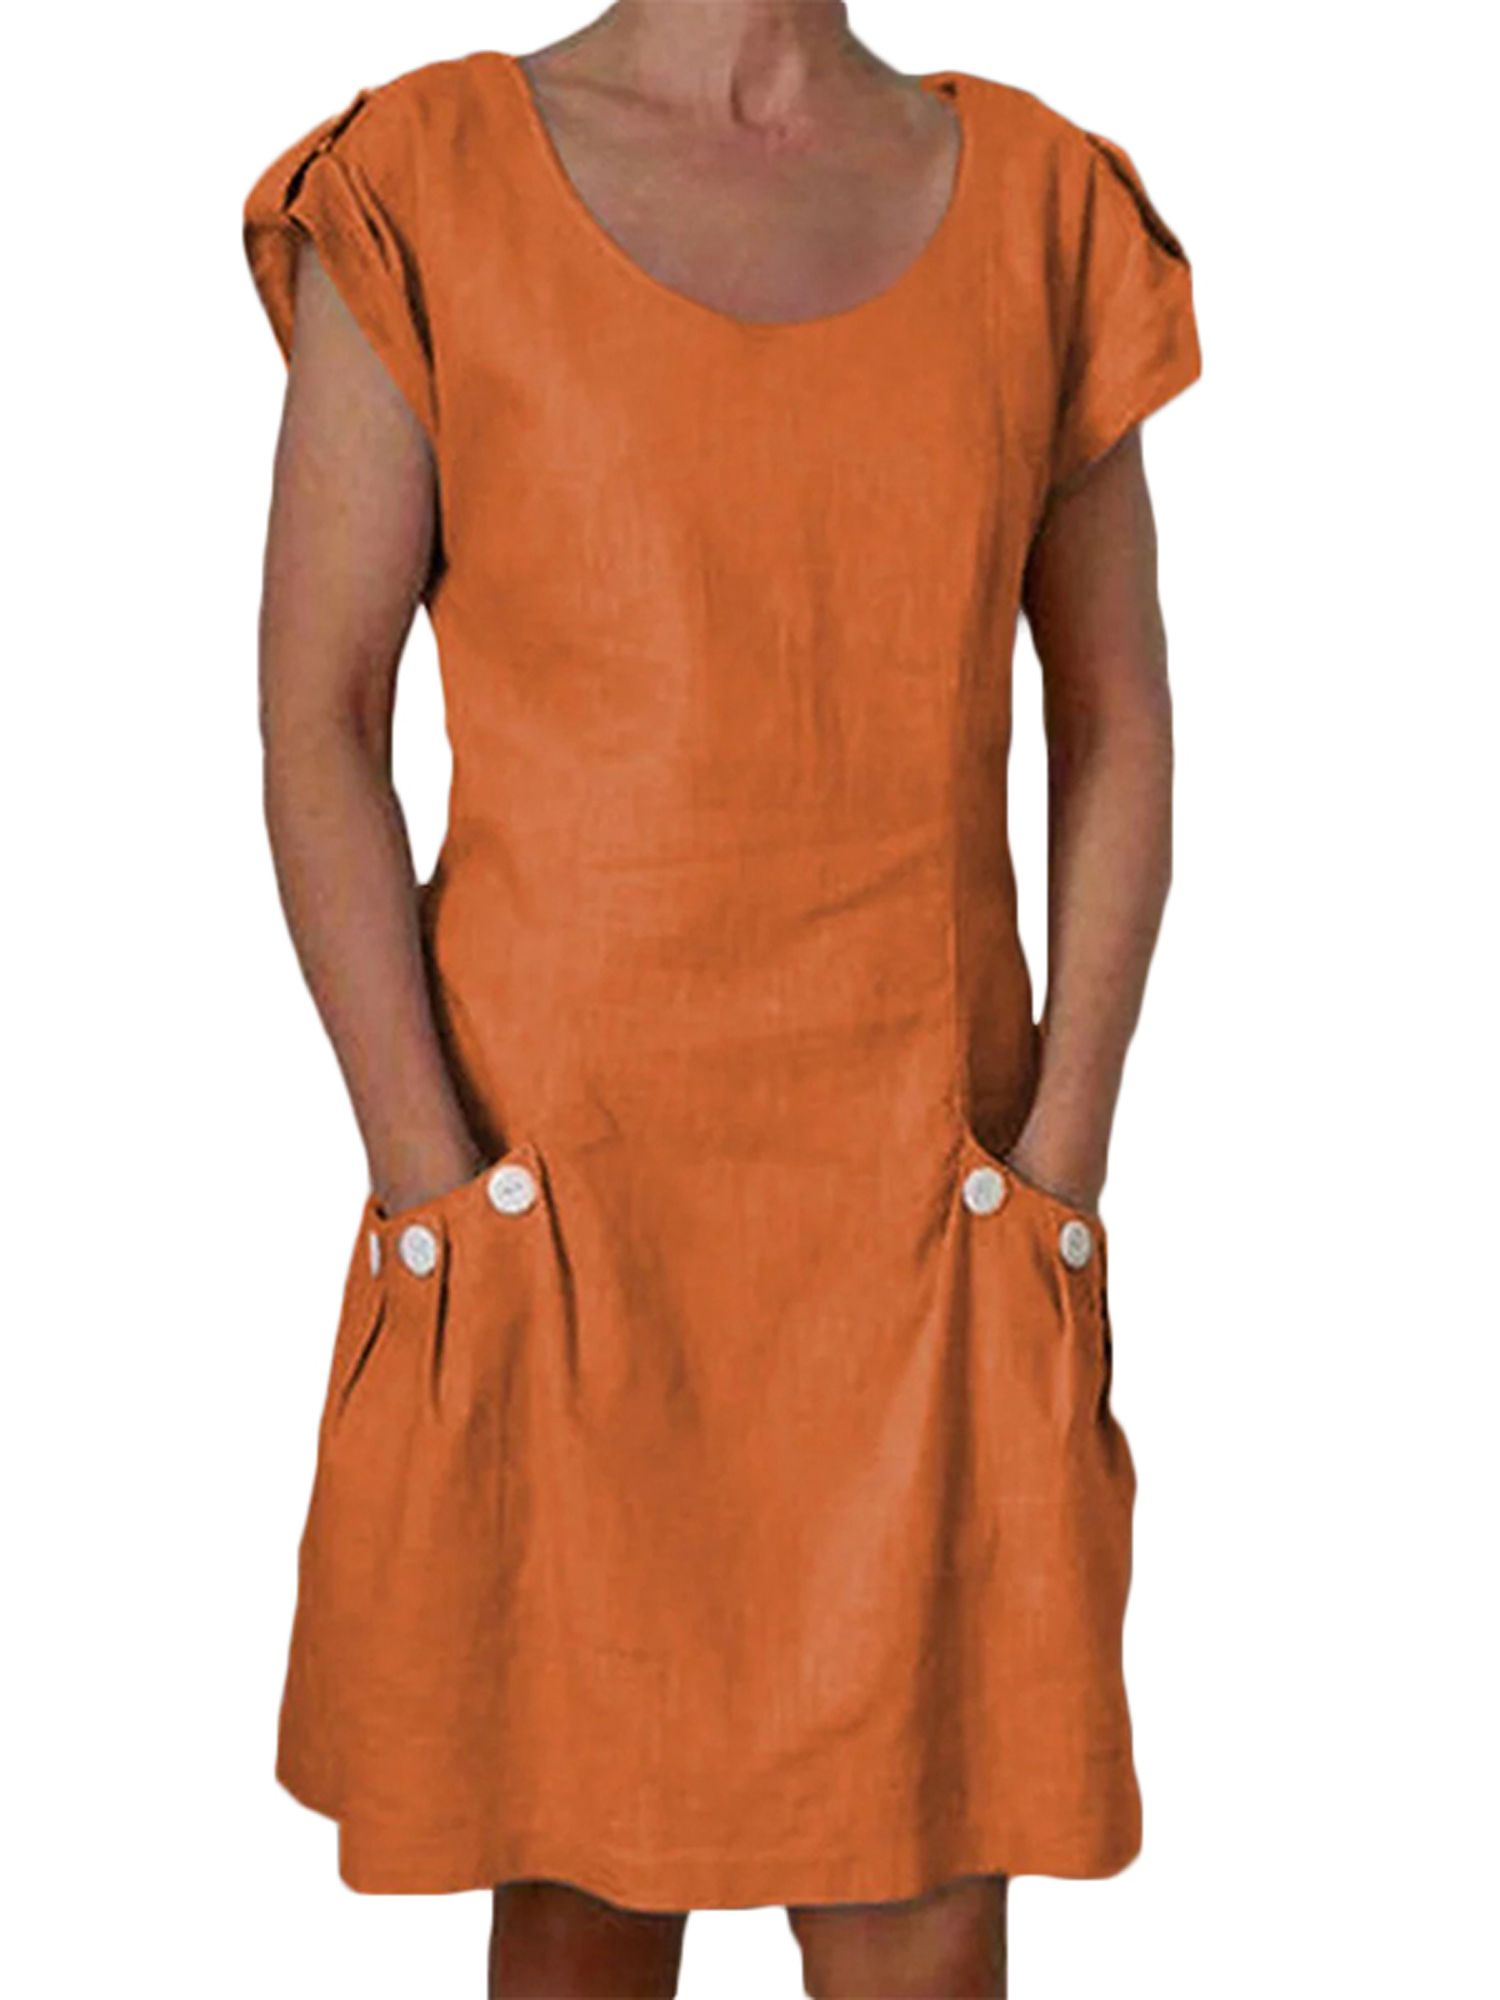 Wodstyle Women S Summer Short Sleeve Linen Tunic Mini Dress Sundress Plus Size Beach Walmart Com Dress Shirts For Women Mini Dress Casual Womens Dresses [ 2000 x 1500 Pixel ]